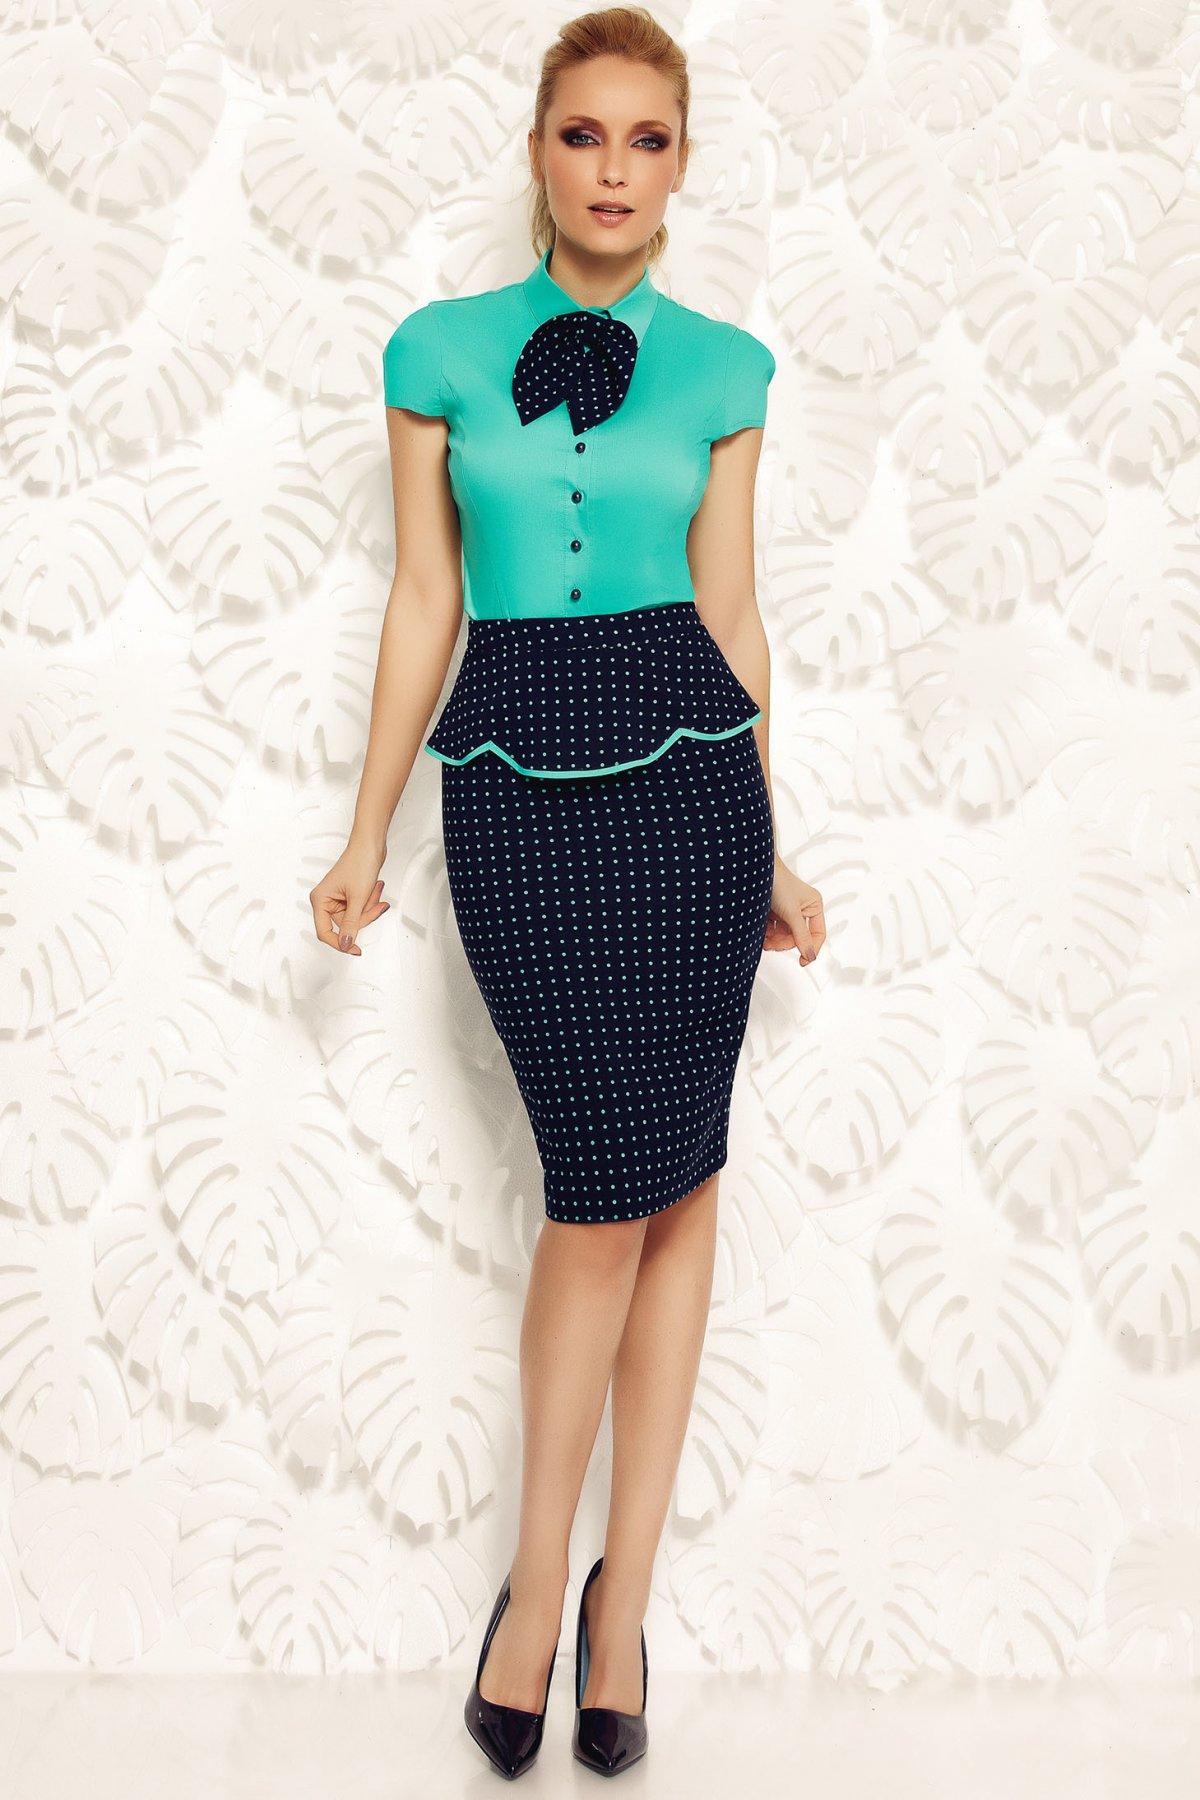 Camasa dama Fofy verde office din bumbac elastic cu un croi mulat accesorizata cu o fundita